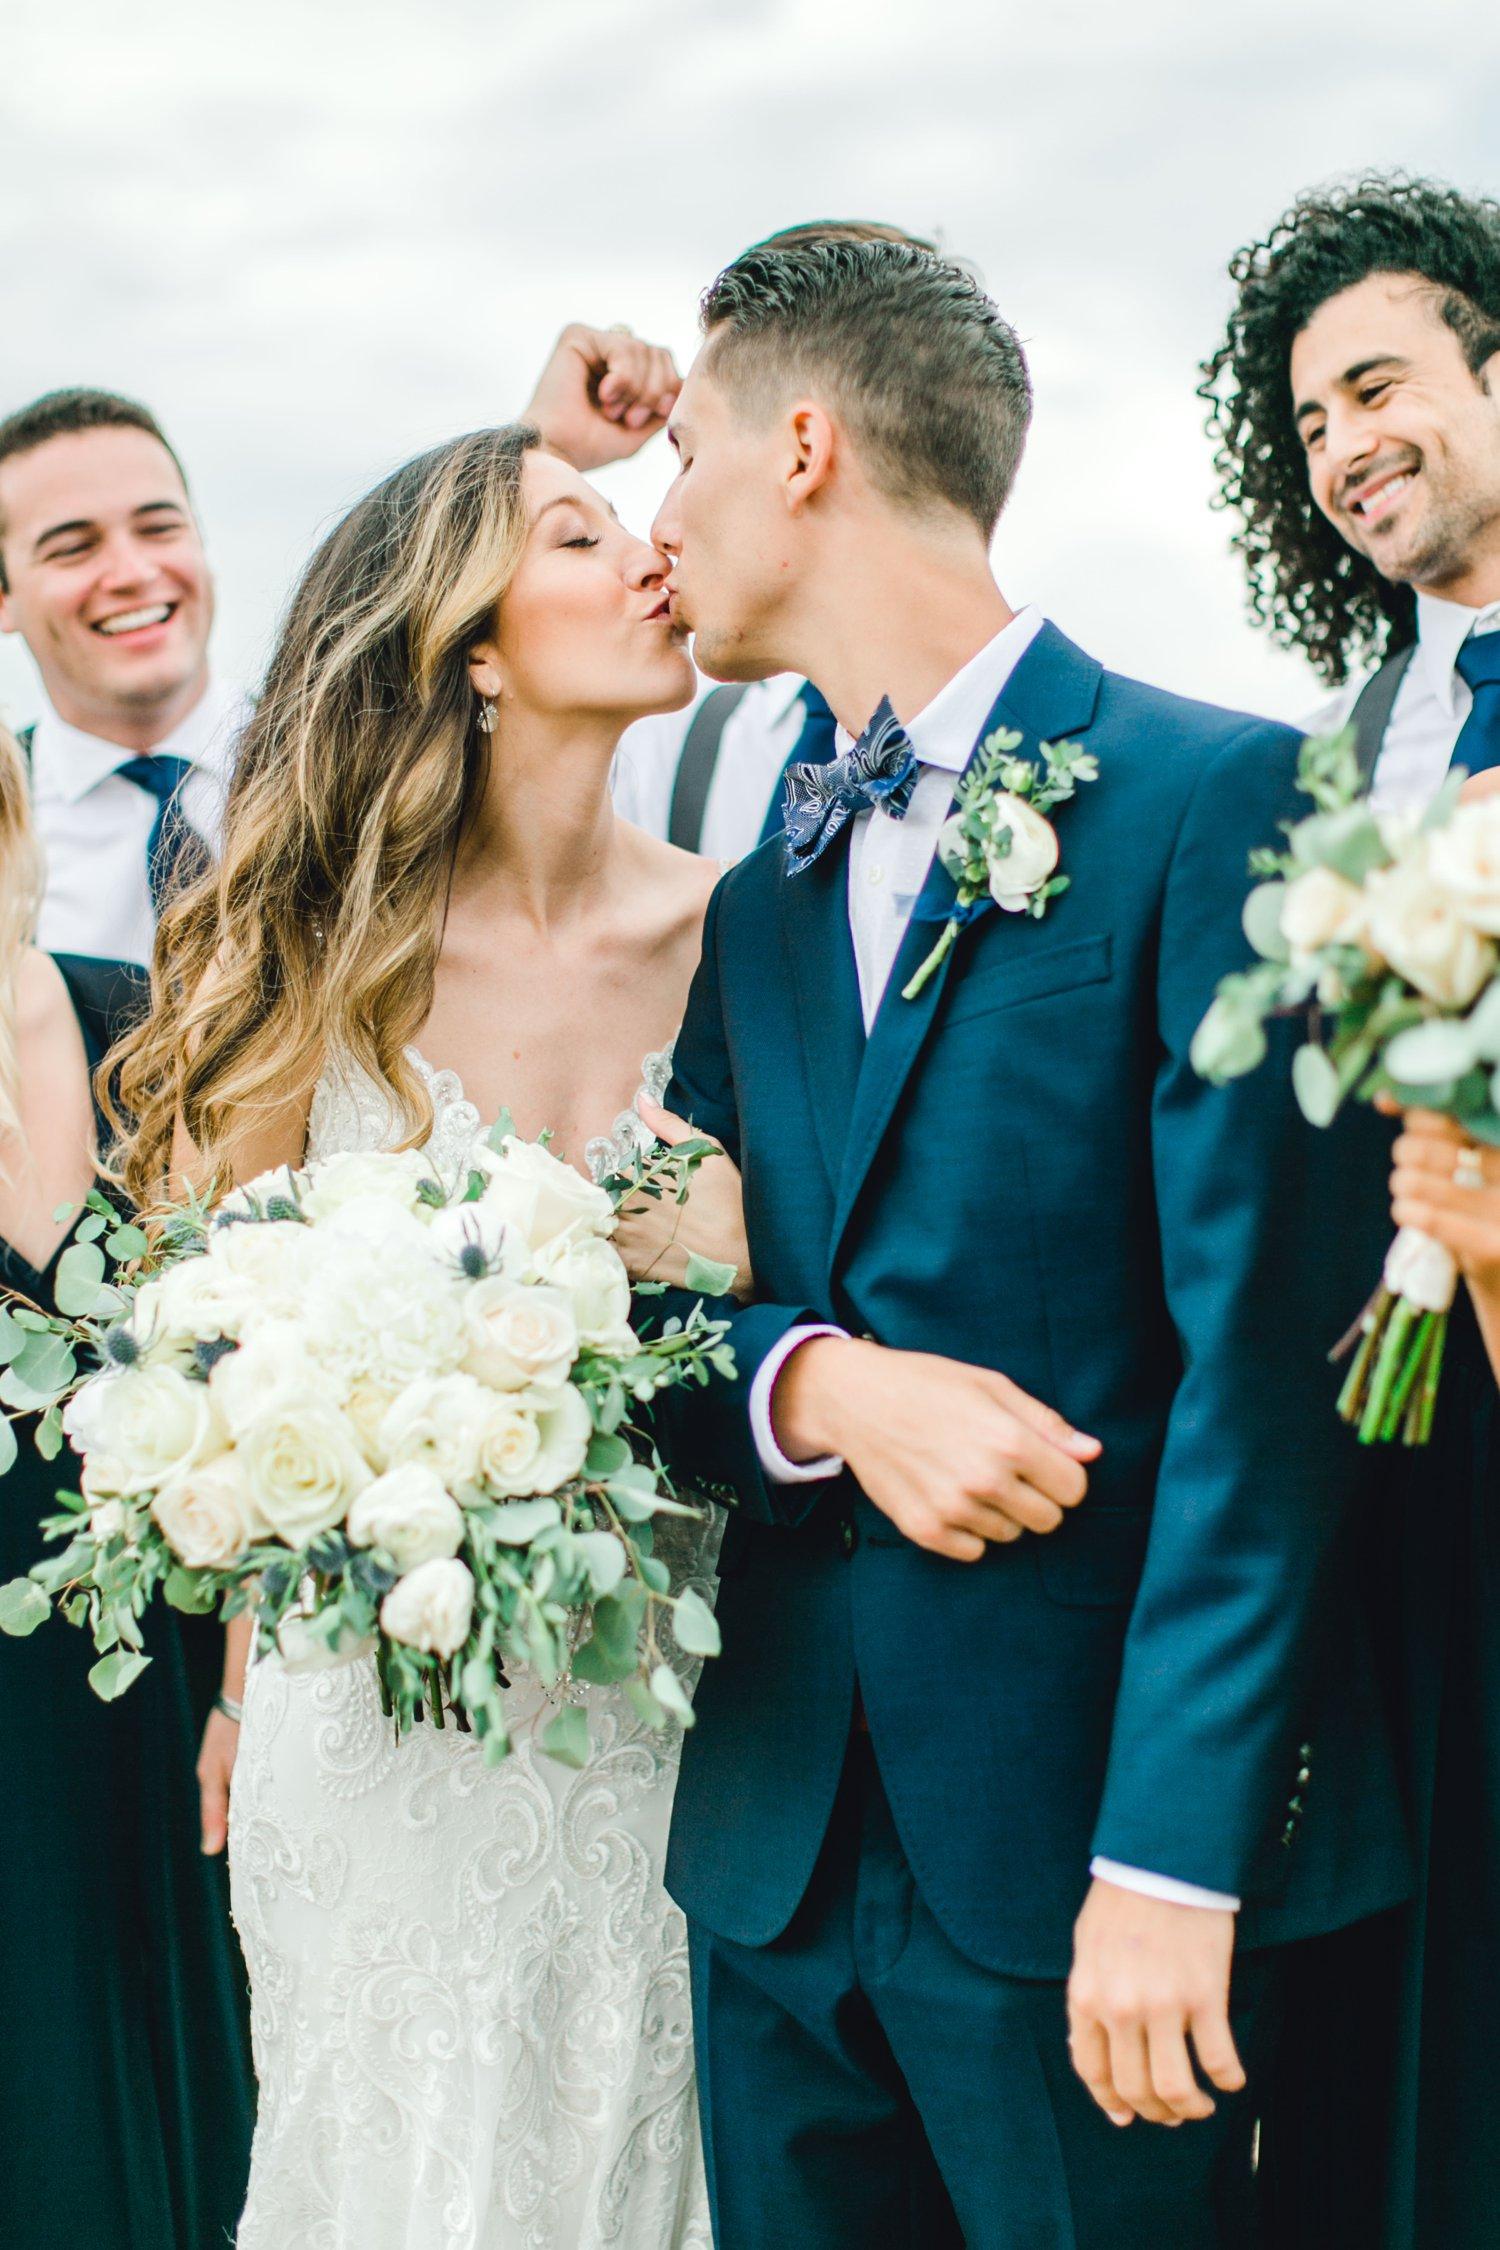 Ashley_John_English_Elegant_Texas_Wedding_Outdoors_Ranch_Caprock_Winery_ALLEEJ_0069.jpg